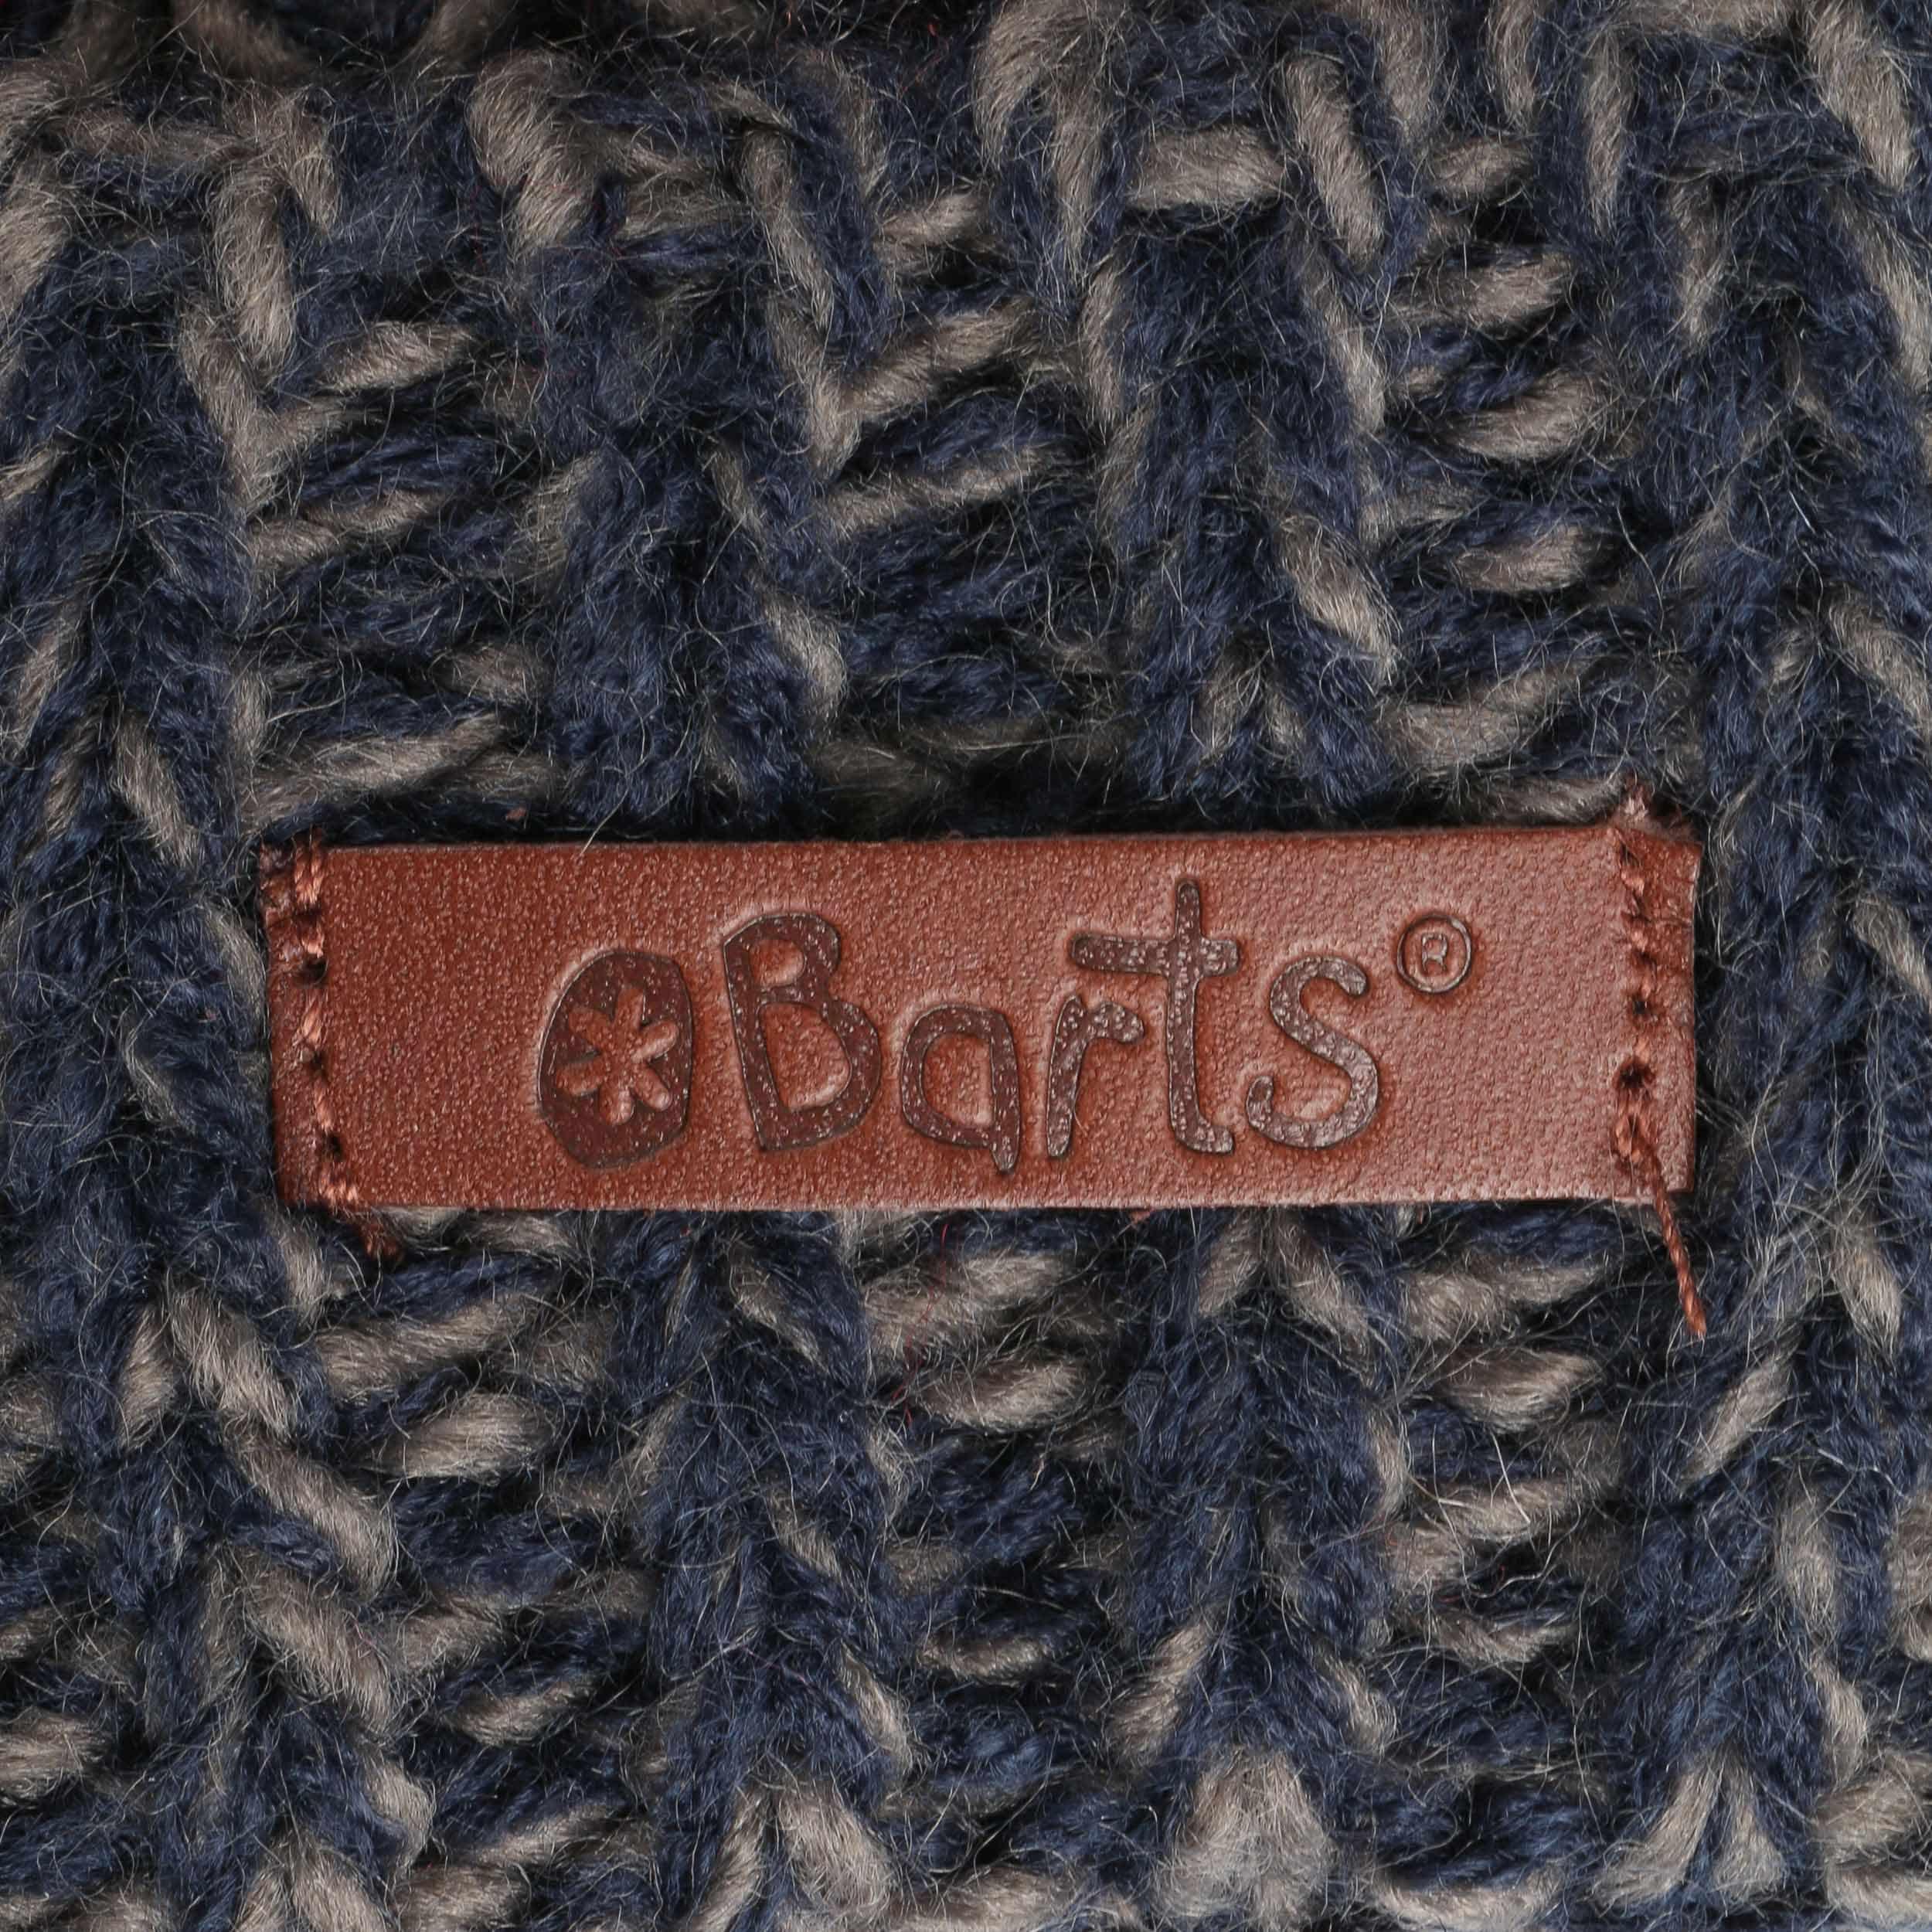 890bc0f6c8428 Gorro de Niño Rhett by Barts - Gorros - sombreroshop.es